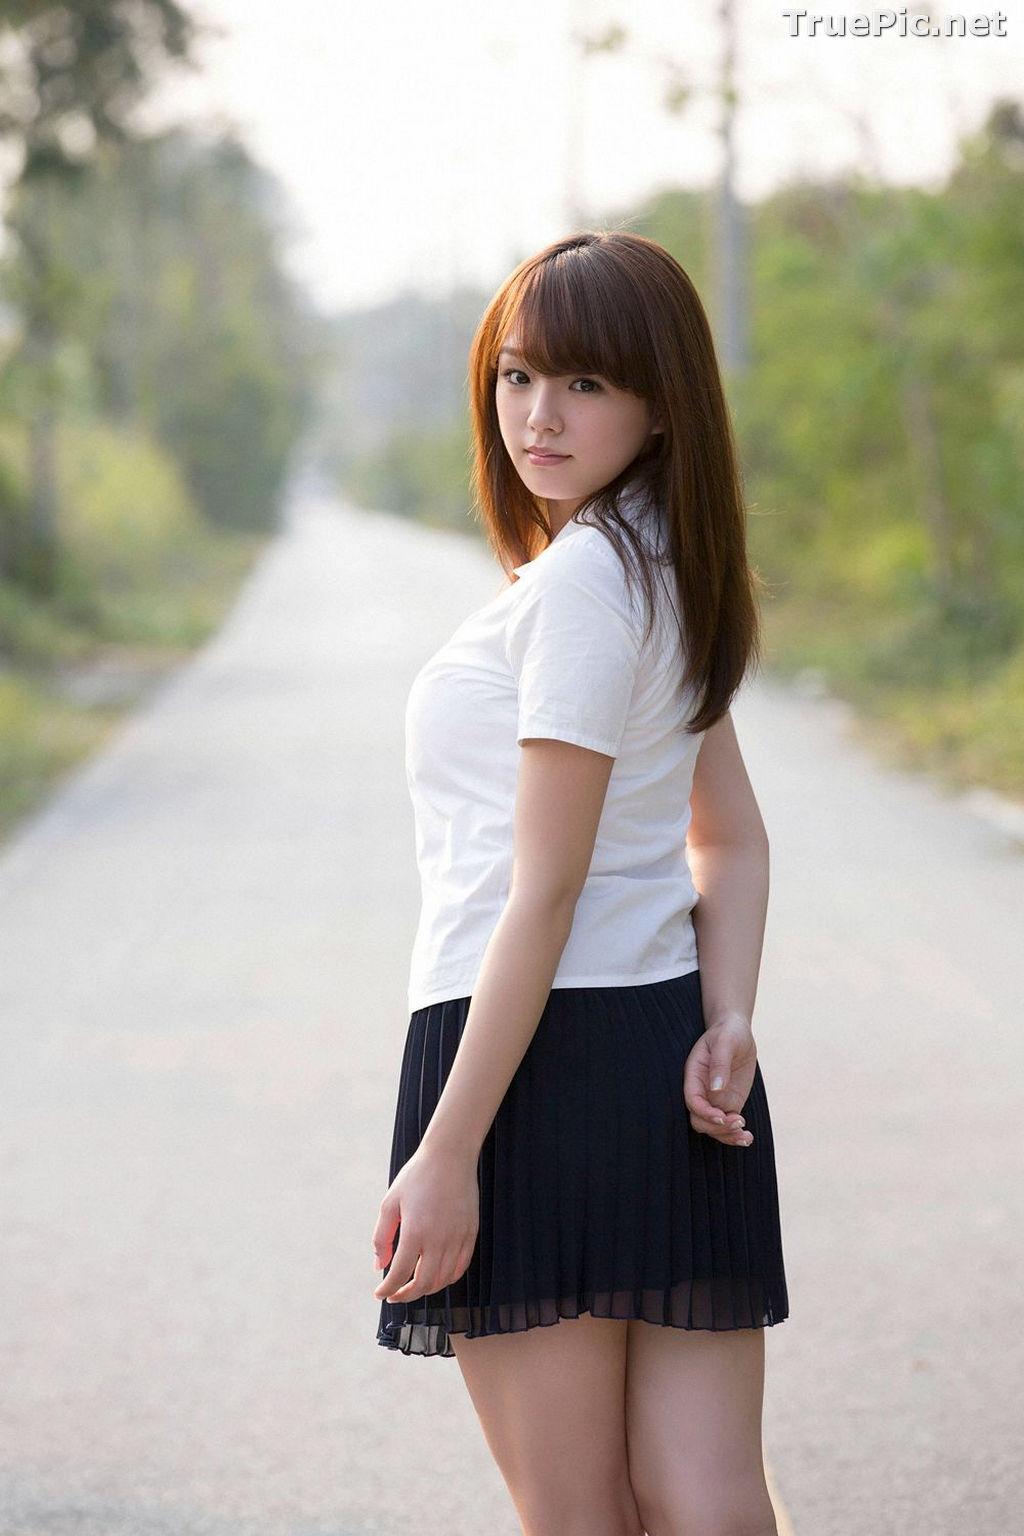 Image [YS Web] Vol.560 - Japanese Gravure Idol and Singer - Ai Shinozaki - TruePic.net - Picture-1